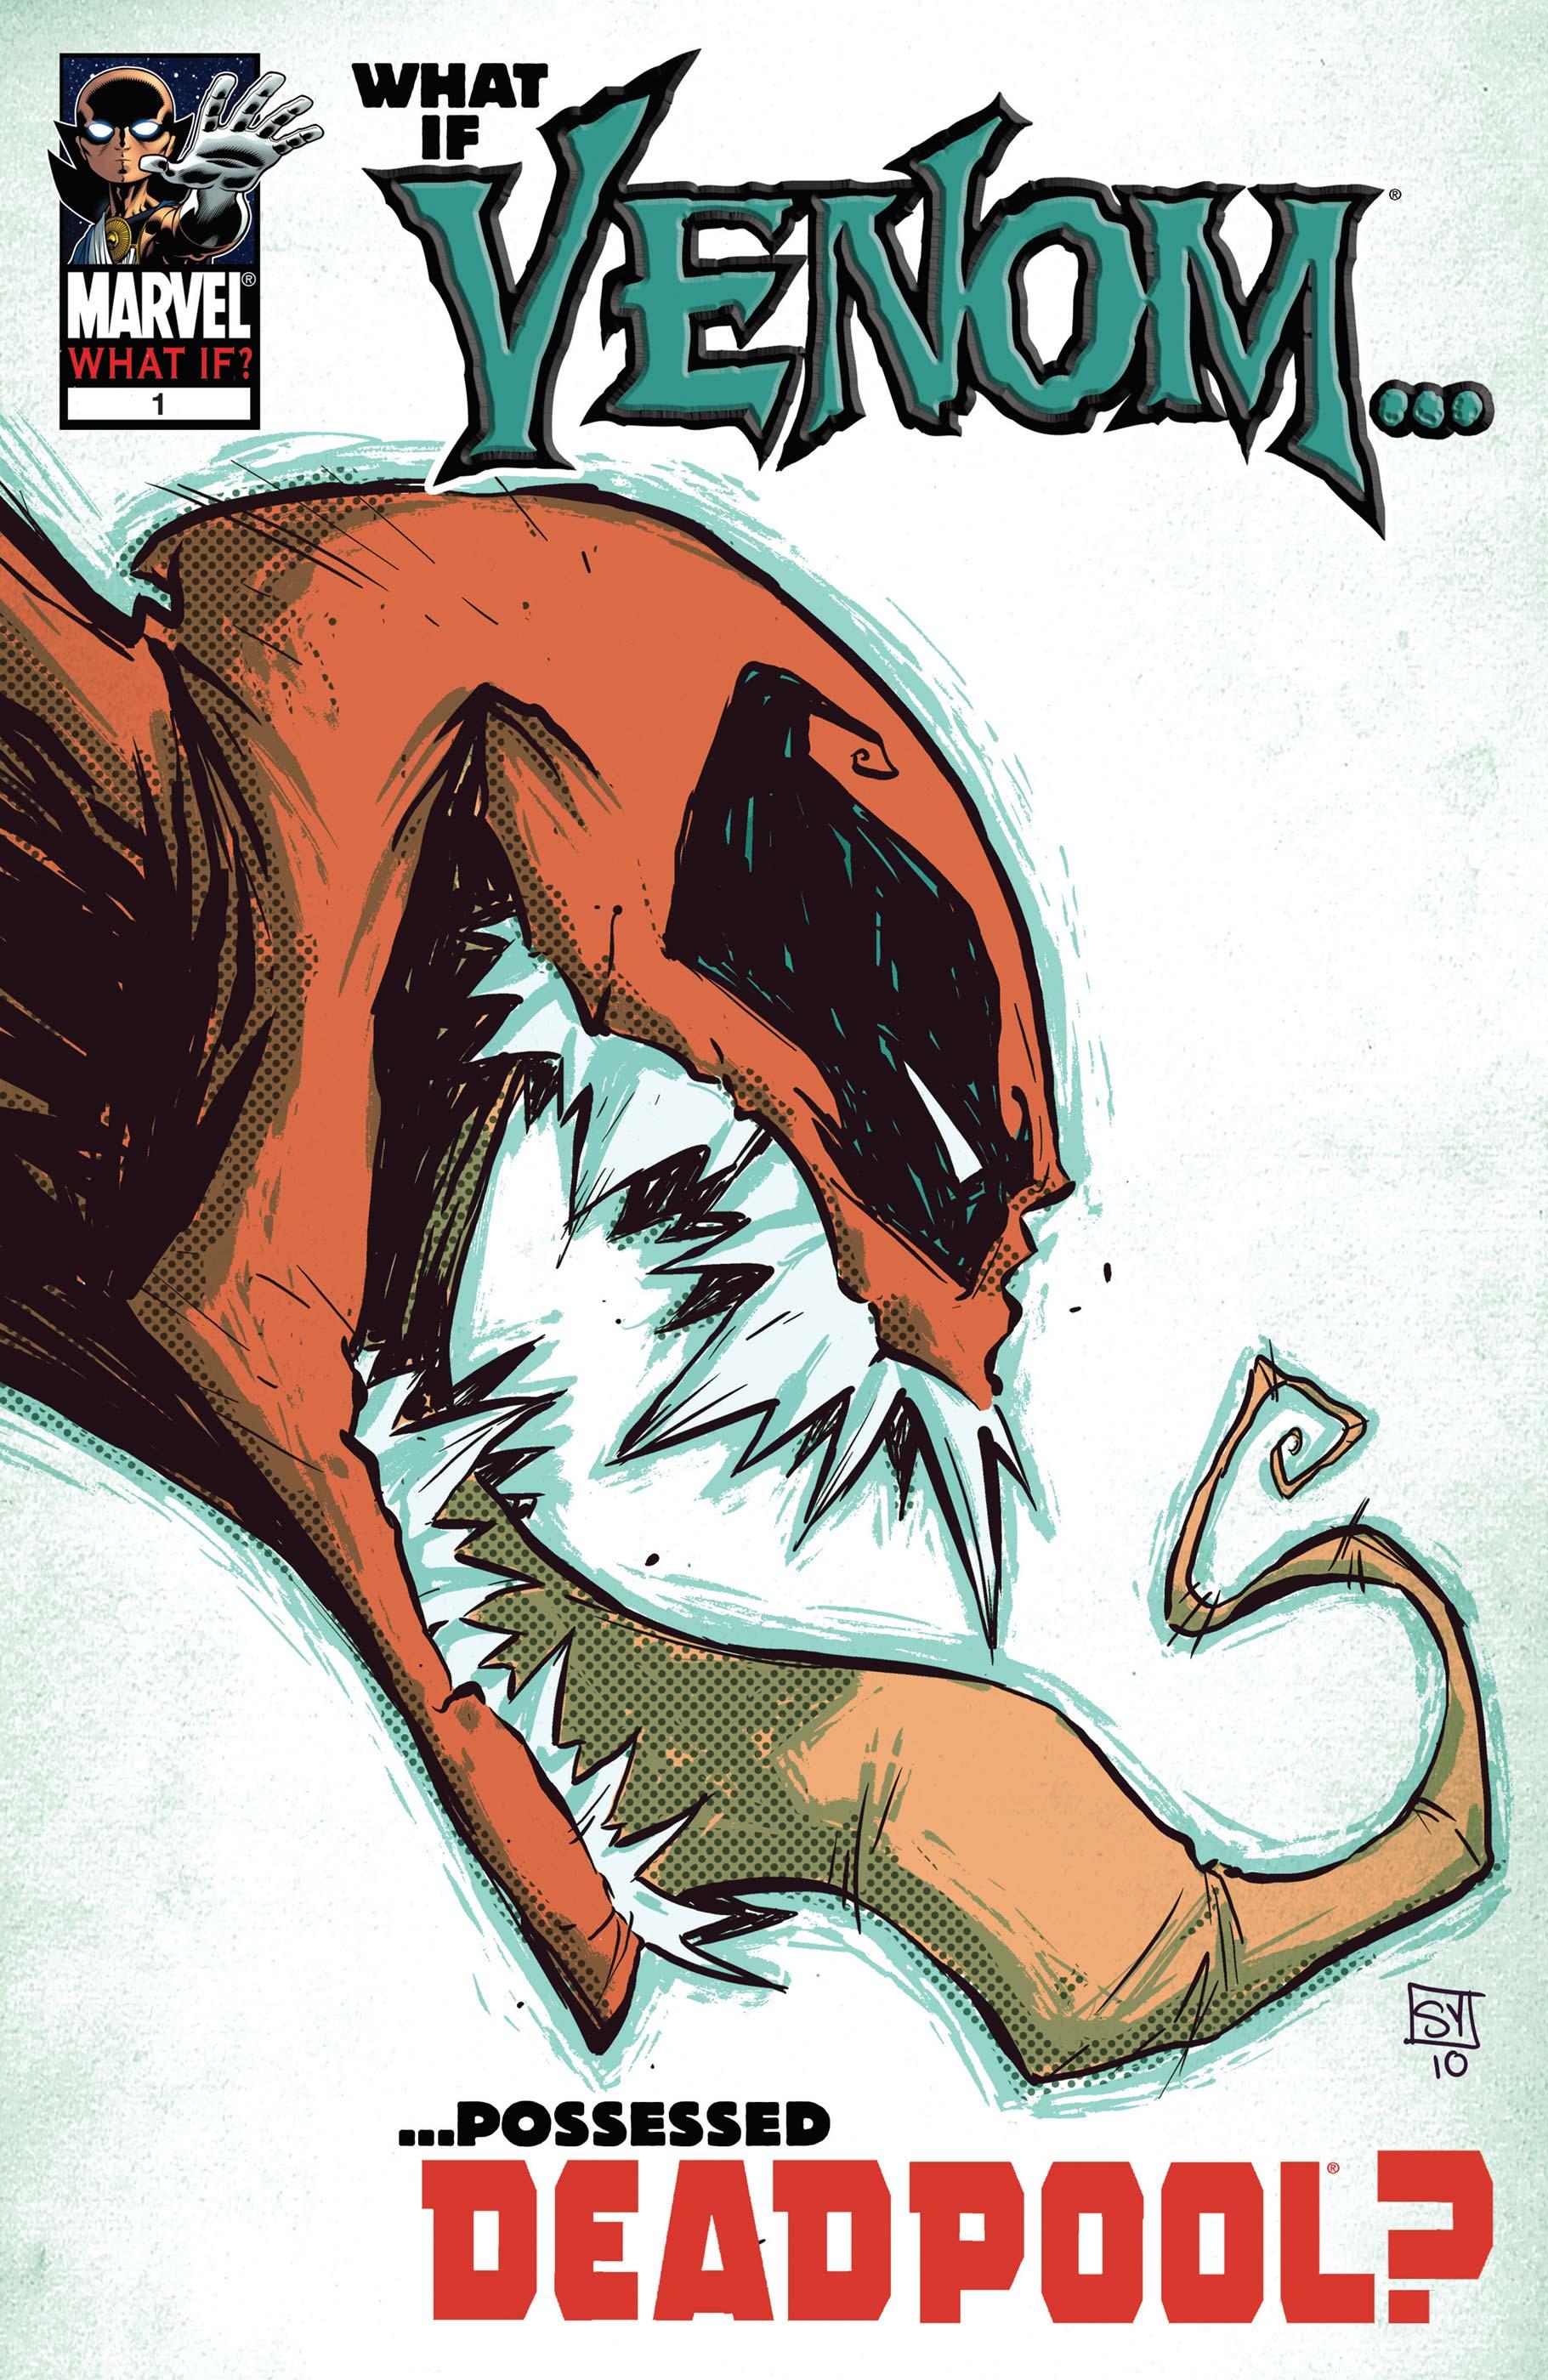 What If? Venom/Deadpool (2010) #1